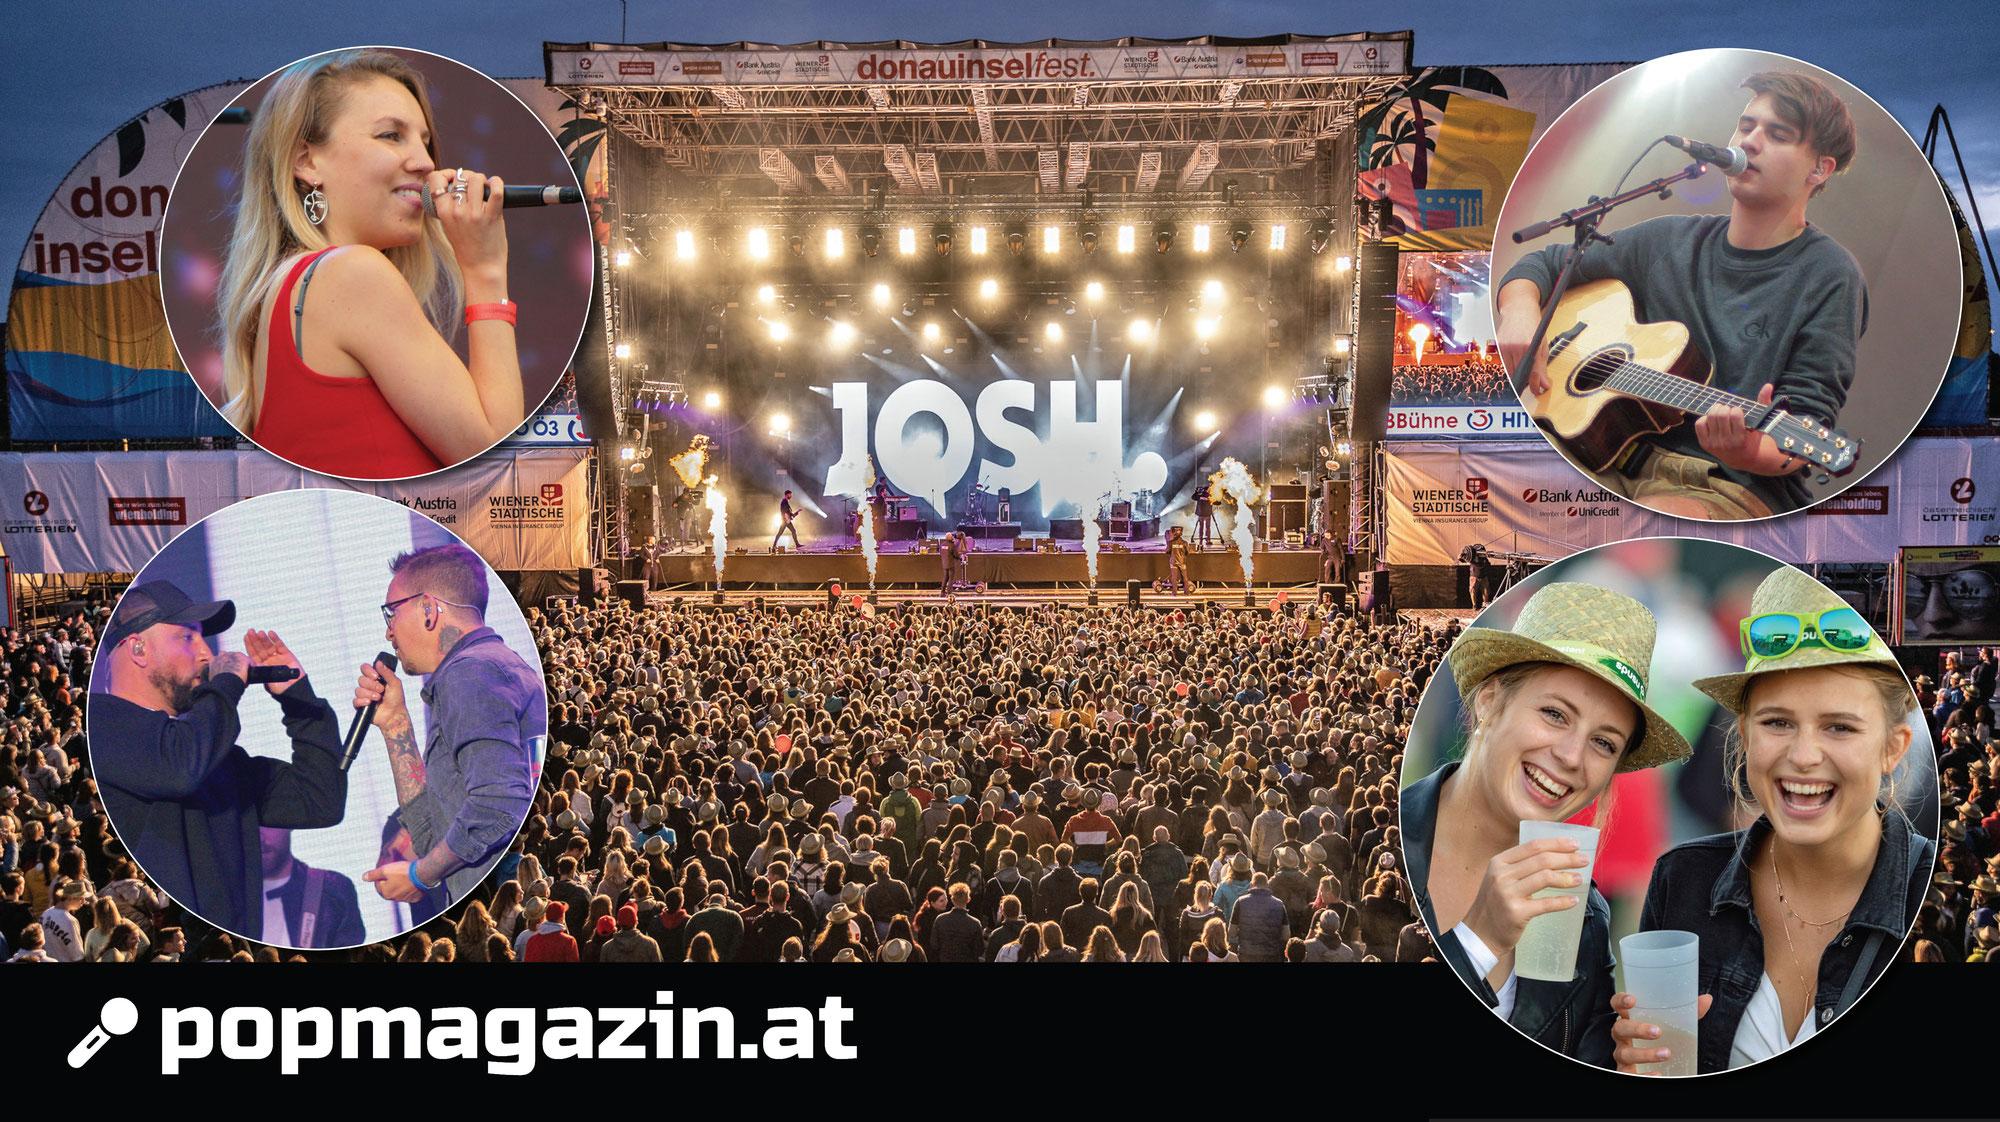 """Gemma Insel!"": So feierten 34.000 Fans das 38. Donauinselfest"